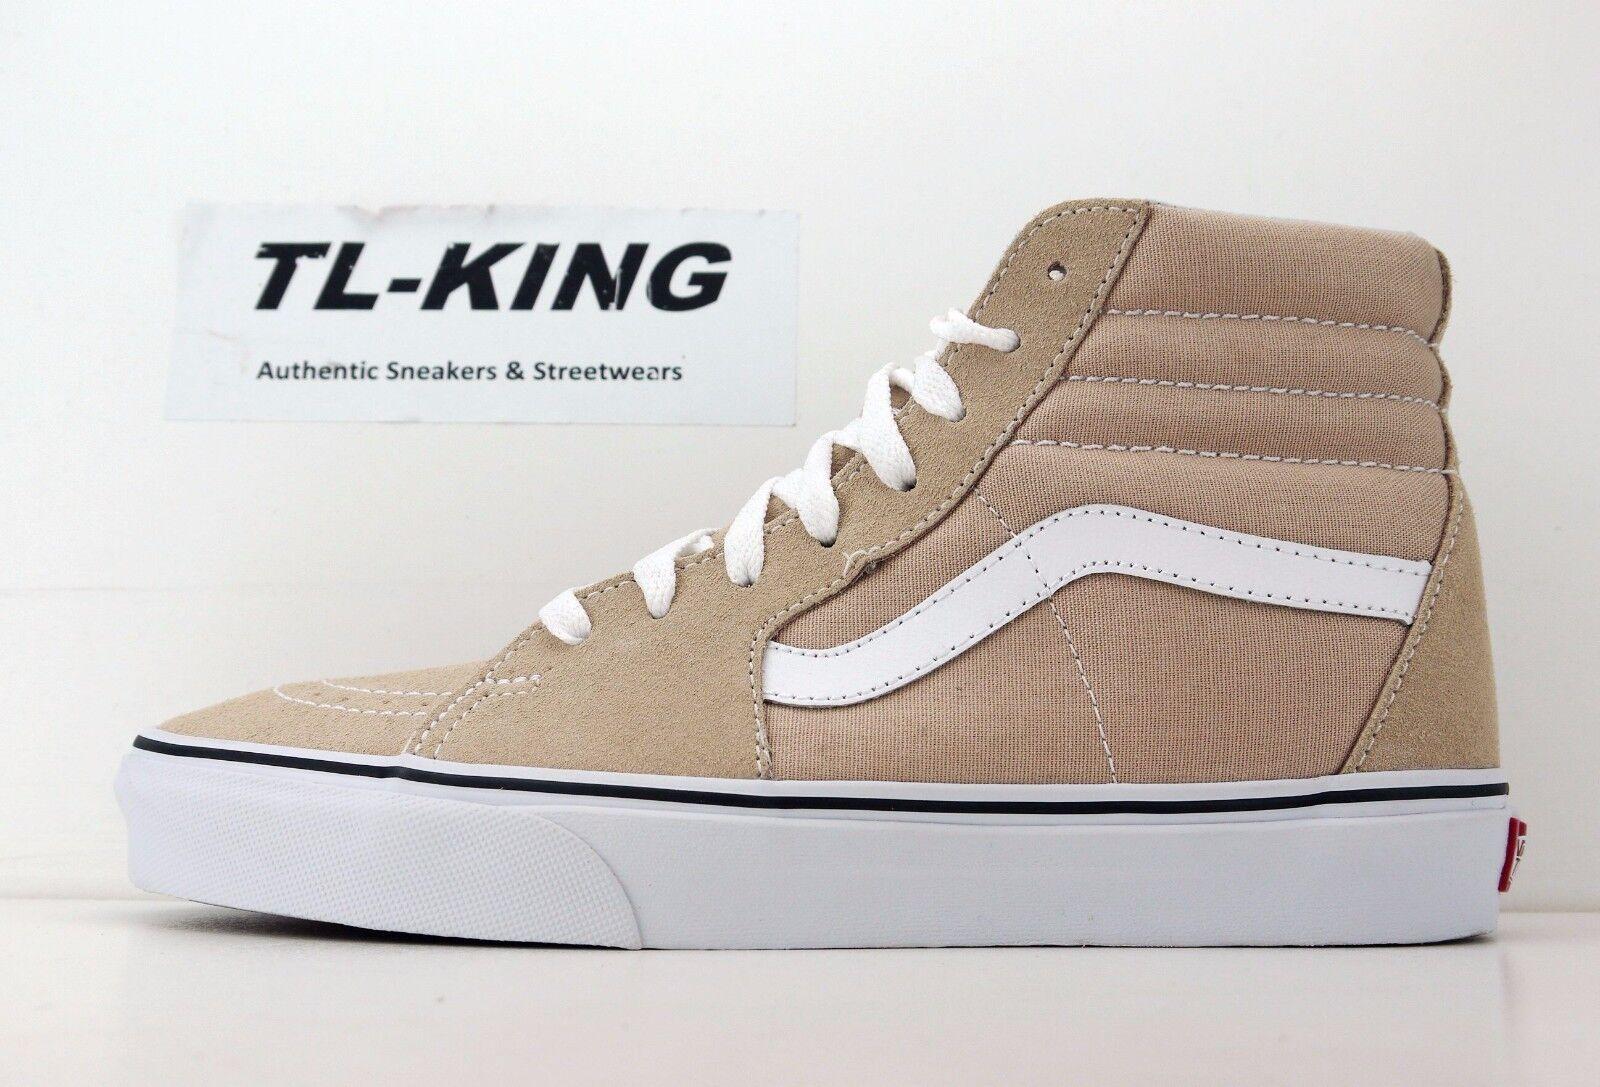 furgoni sk8 hi frappe 'vero bianco classico classico bianco delle scarpe da ginnastica vn0a38geq9x hc 4cb39a